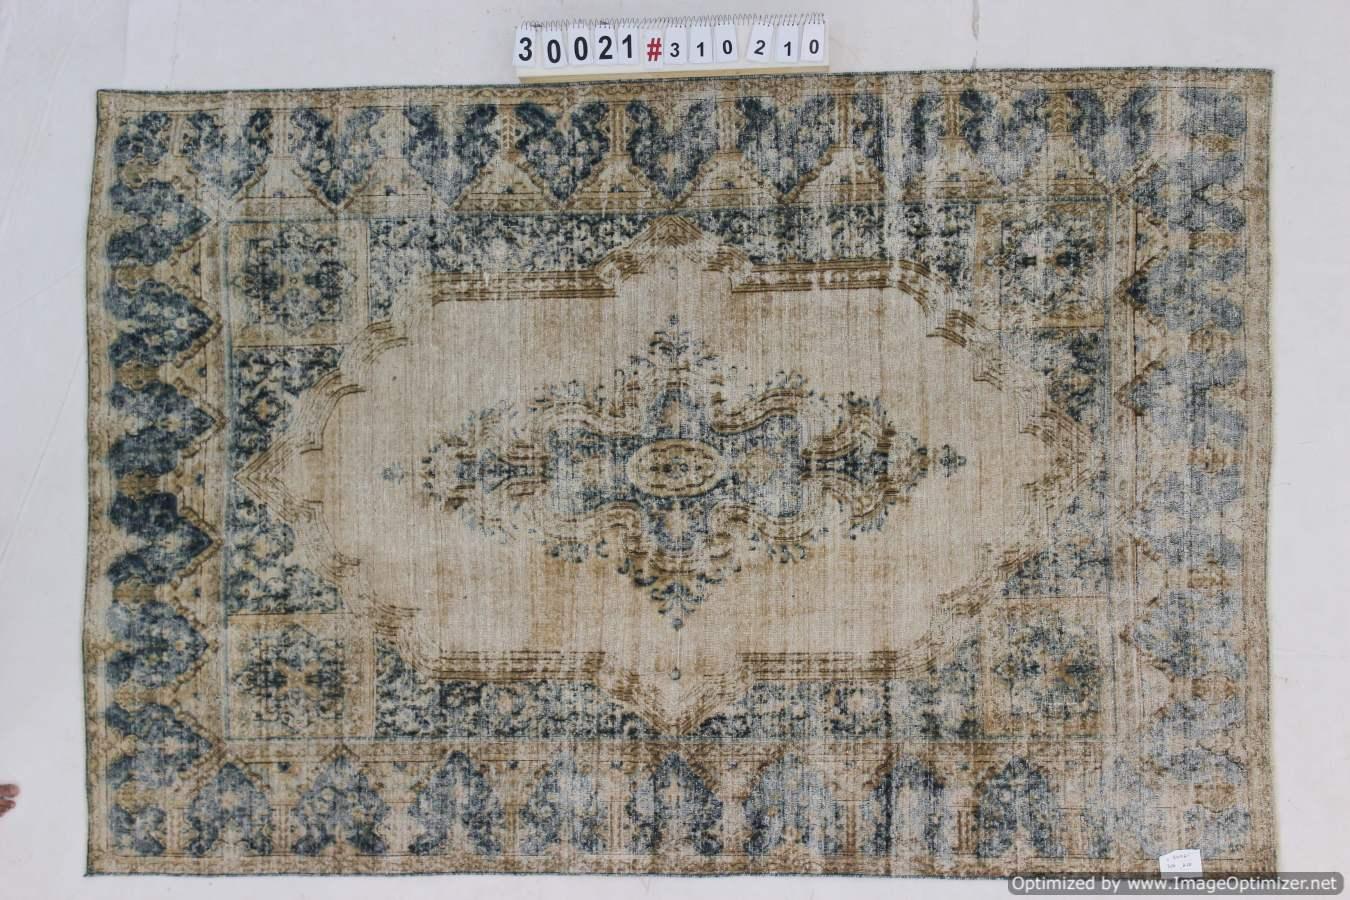 Recoloured tapijt uit Iran 30021 (310cm x 210cm)